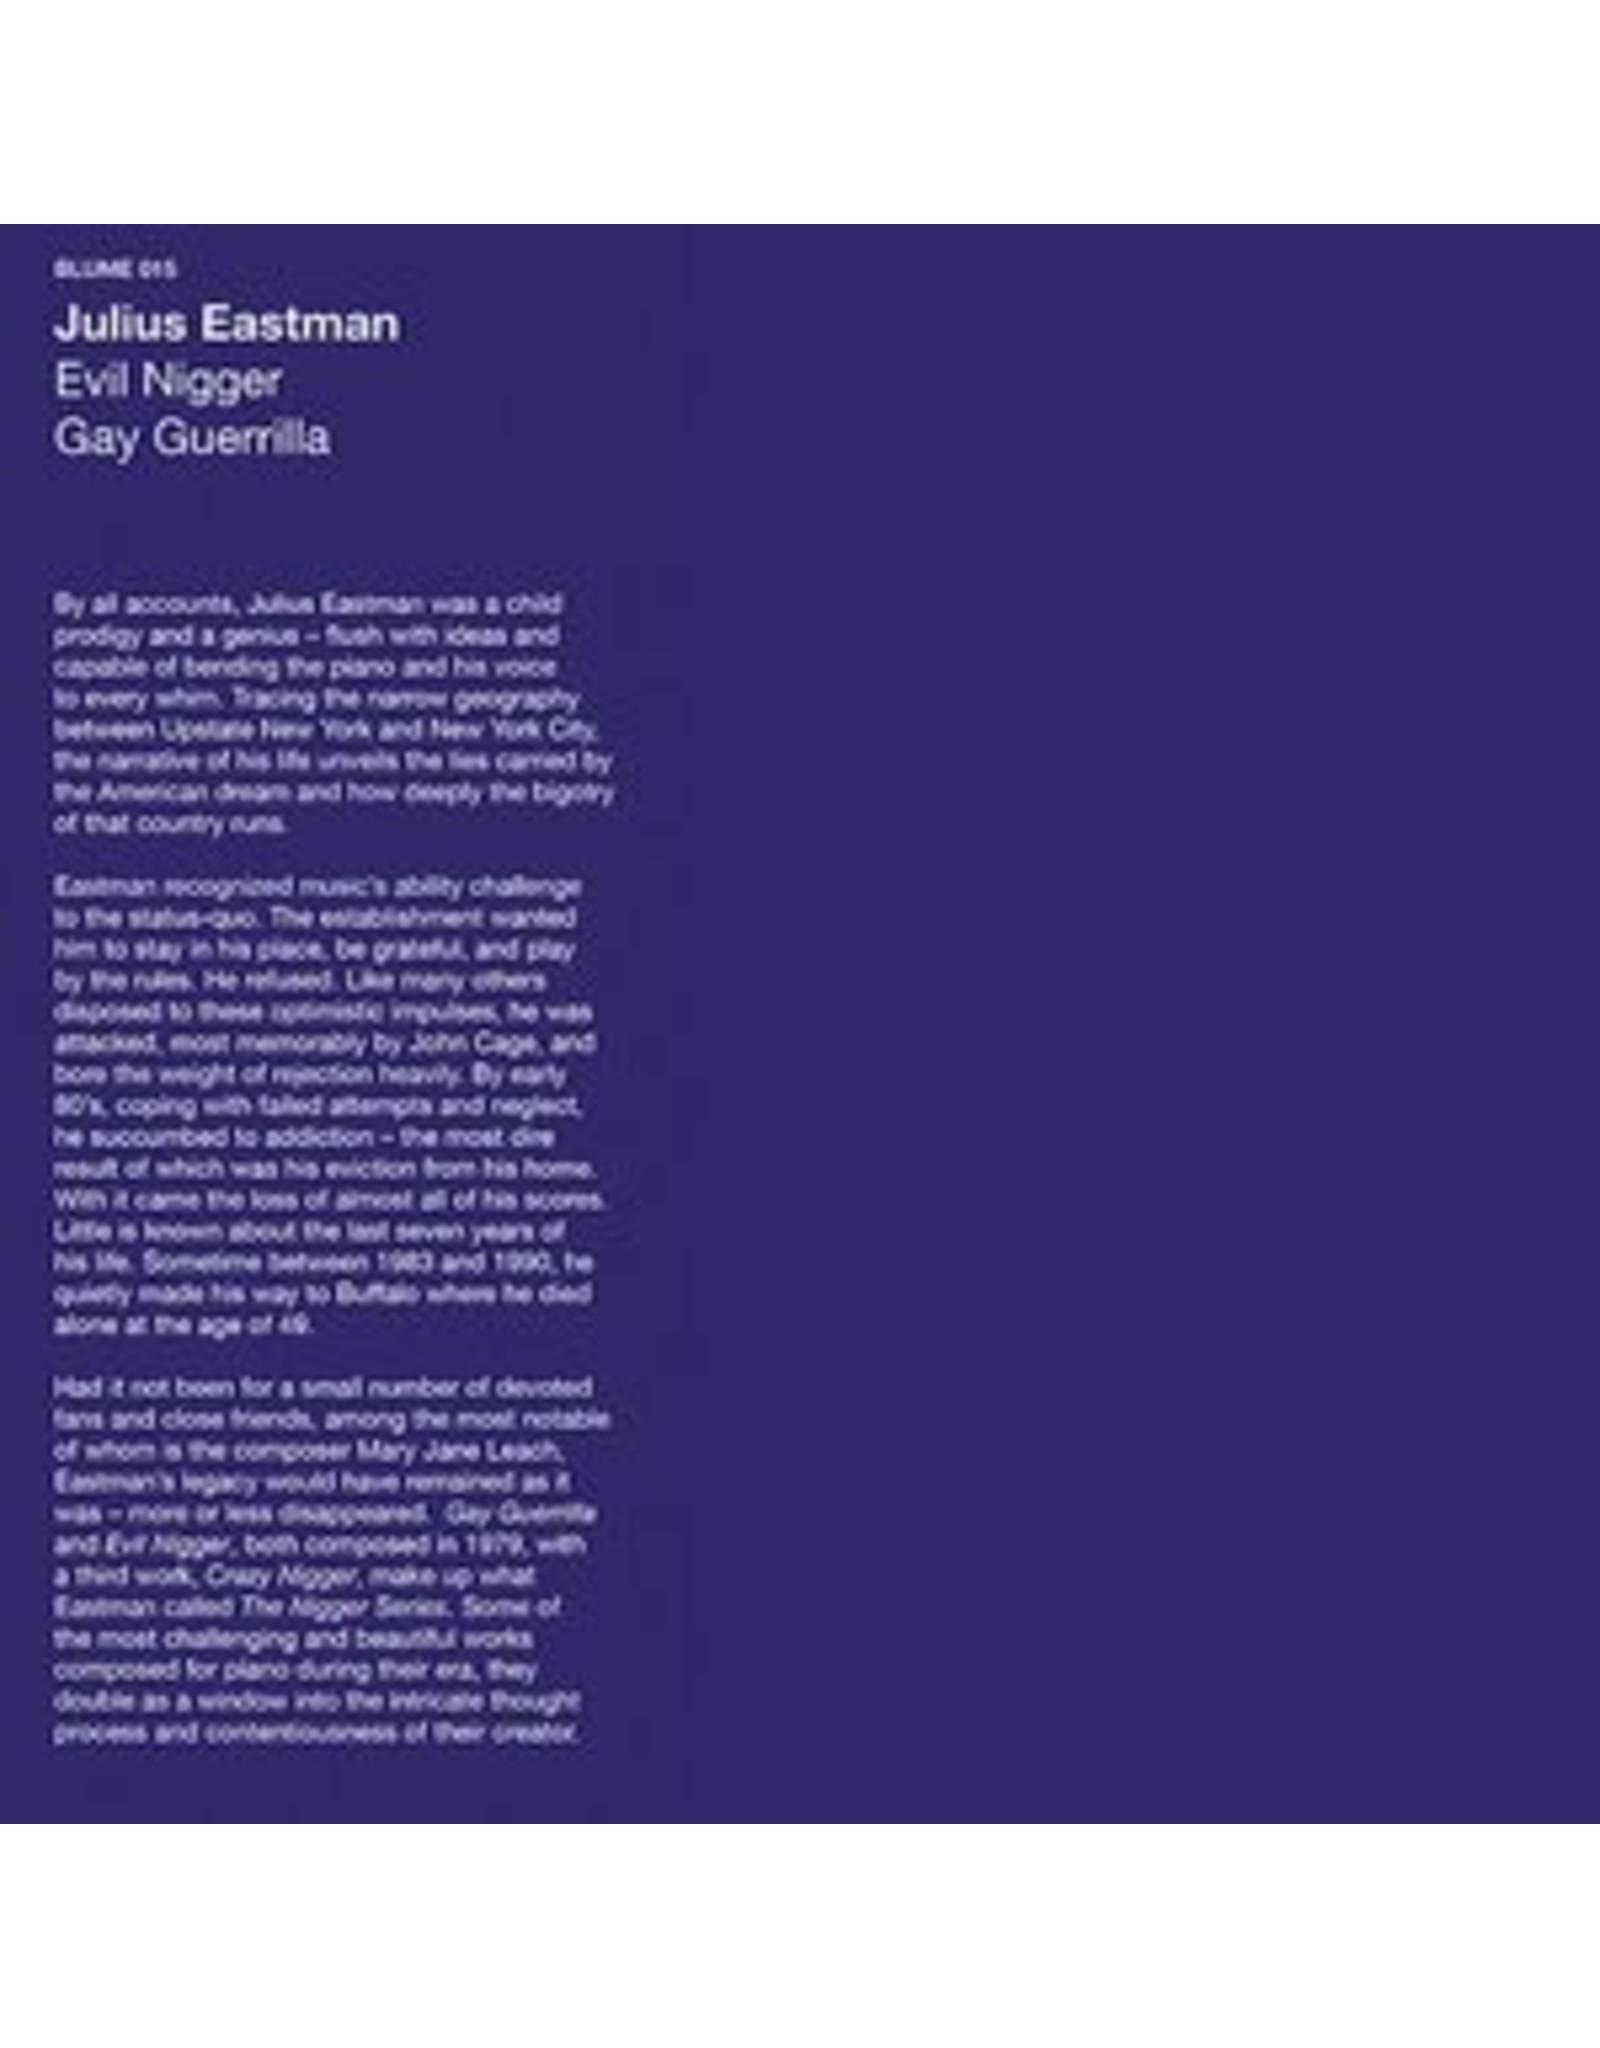 Blume Eastman, Julius: Evil N*gger/Gay Guerilla LP